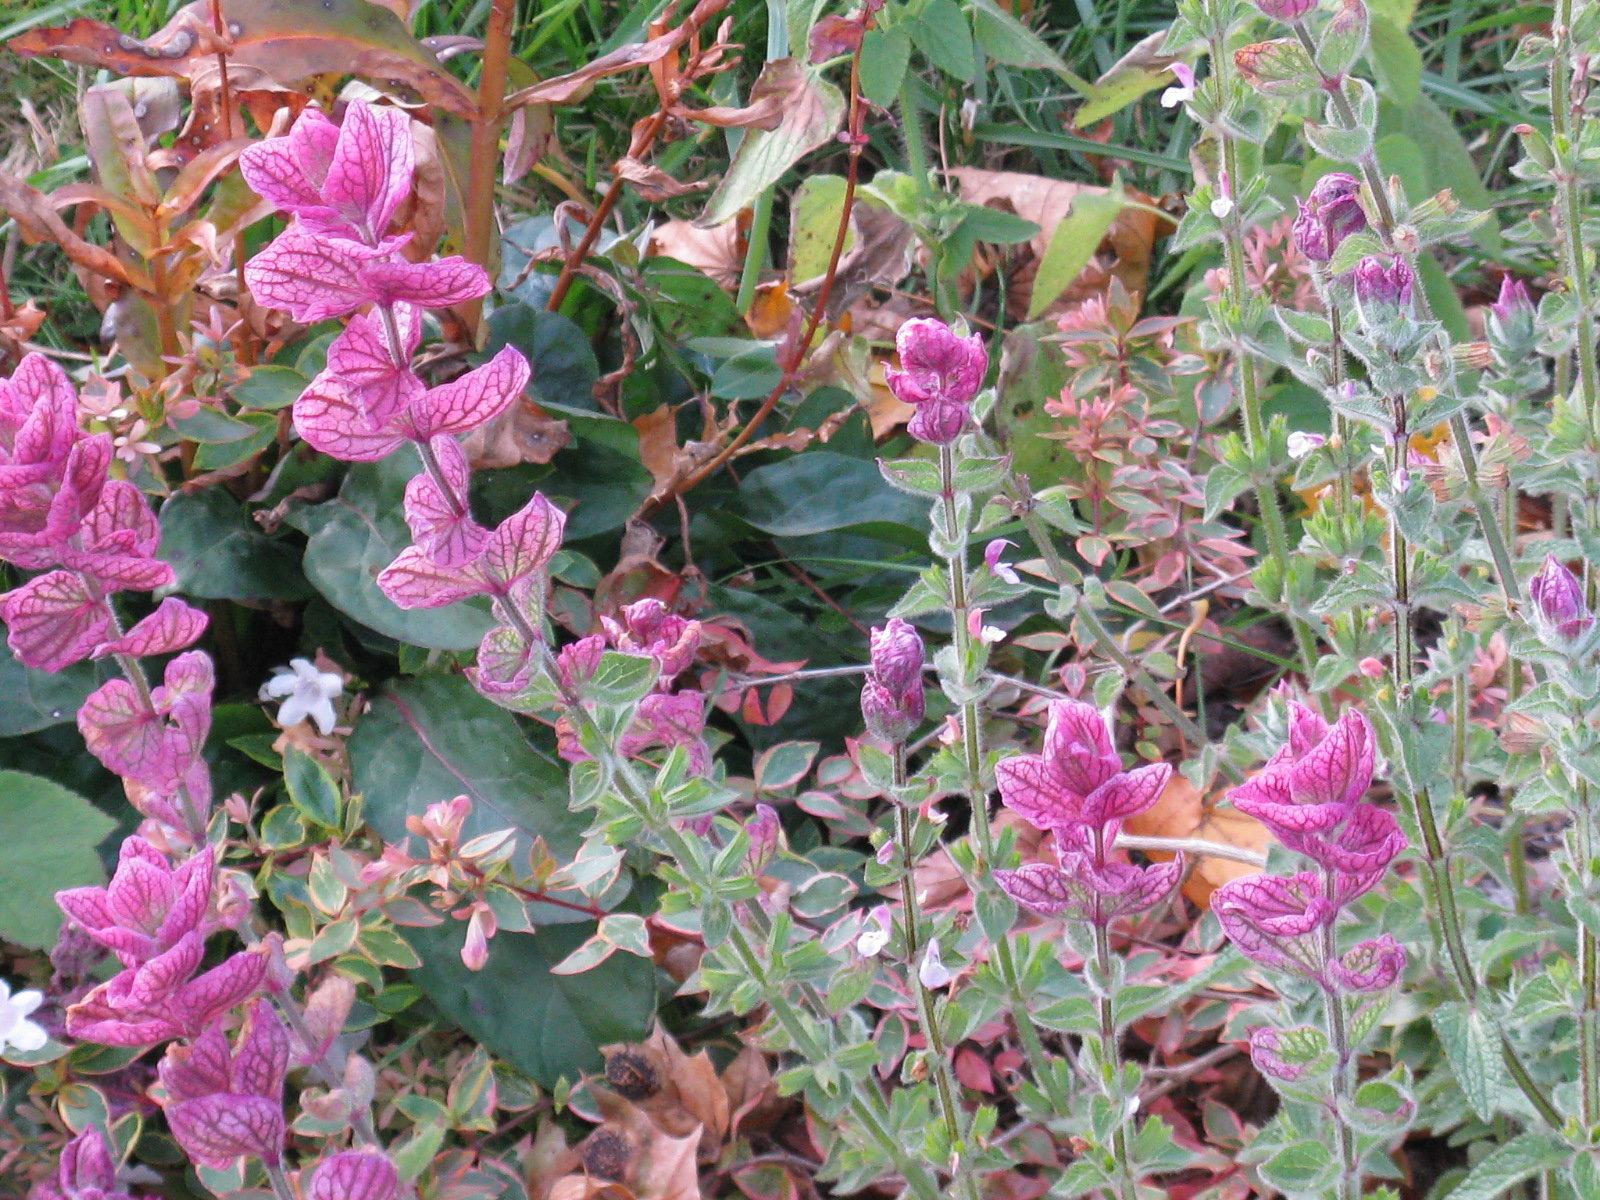 Salvia viridis in pink